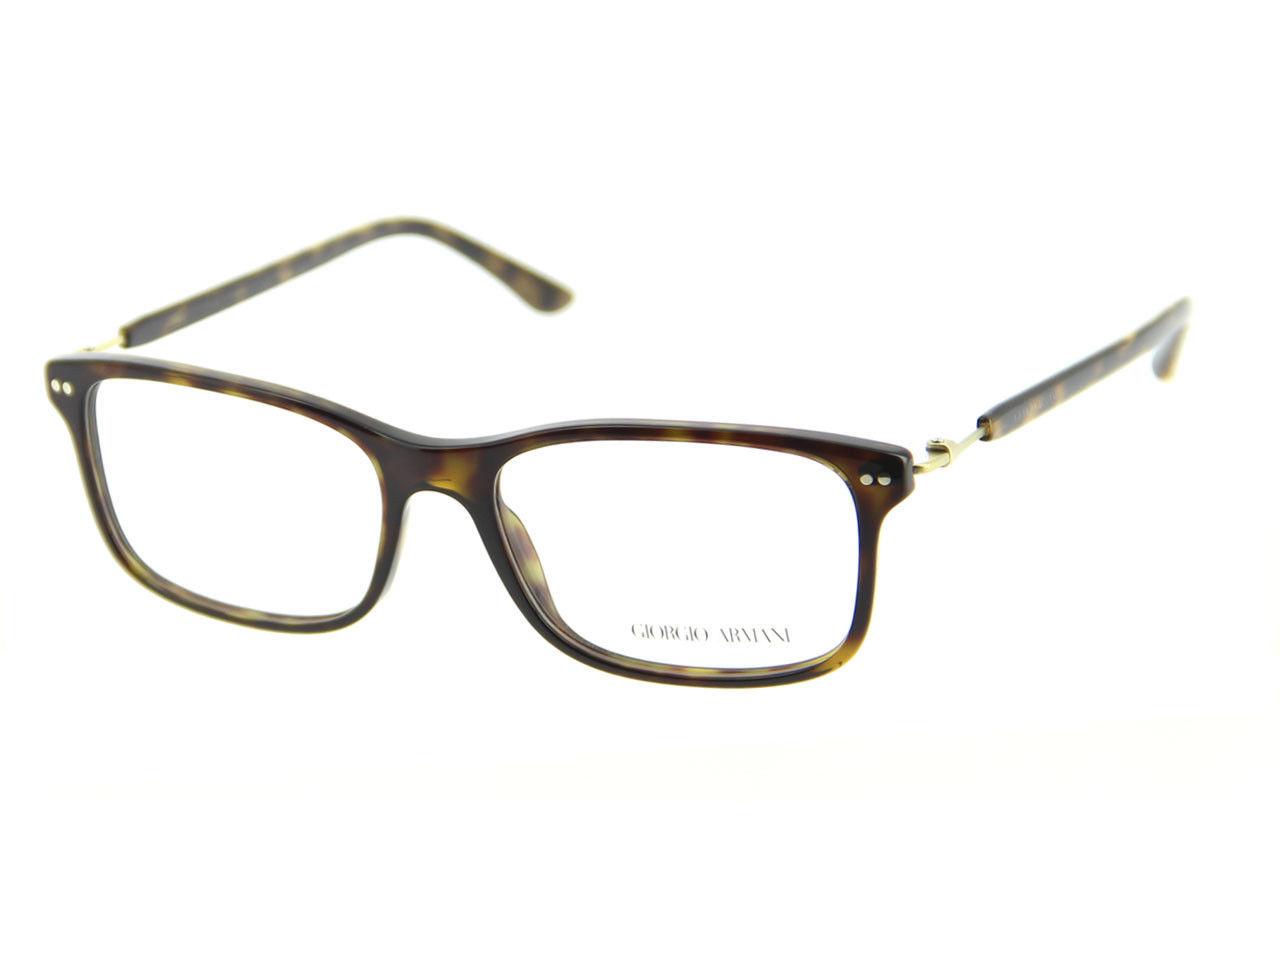 cc214e94b60f Giorgio Armani AR7024 5026 Eyeglasses Havana and 50 similar items. S l1600